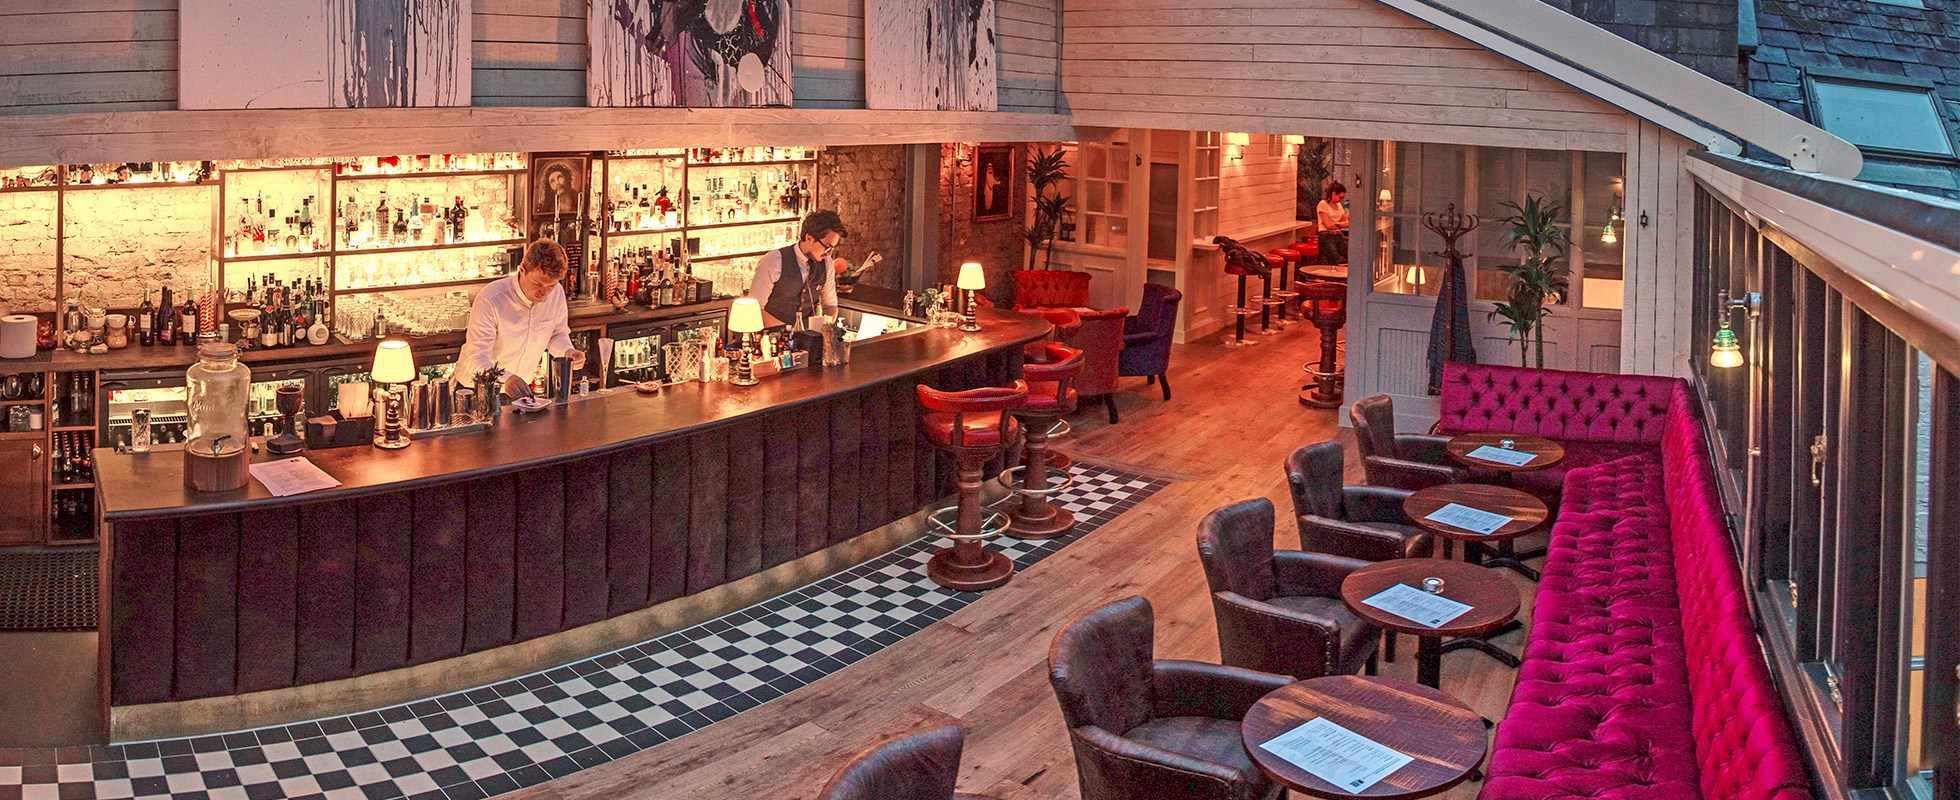 El Gato Negro, Manchester: restaurant review